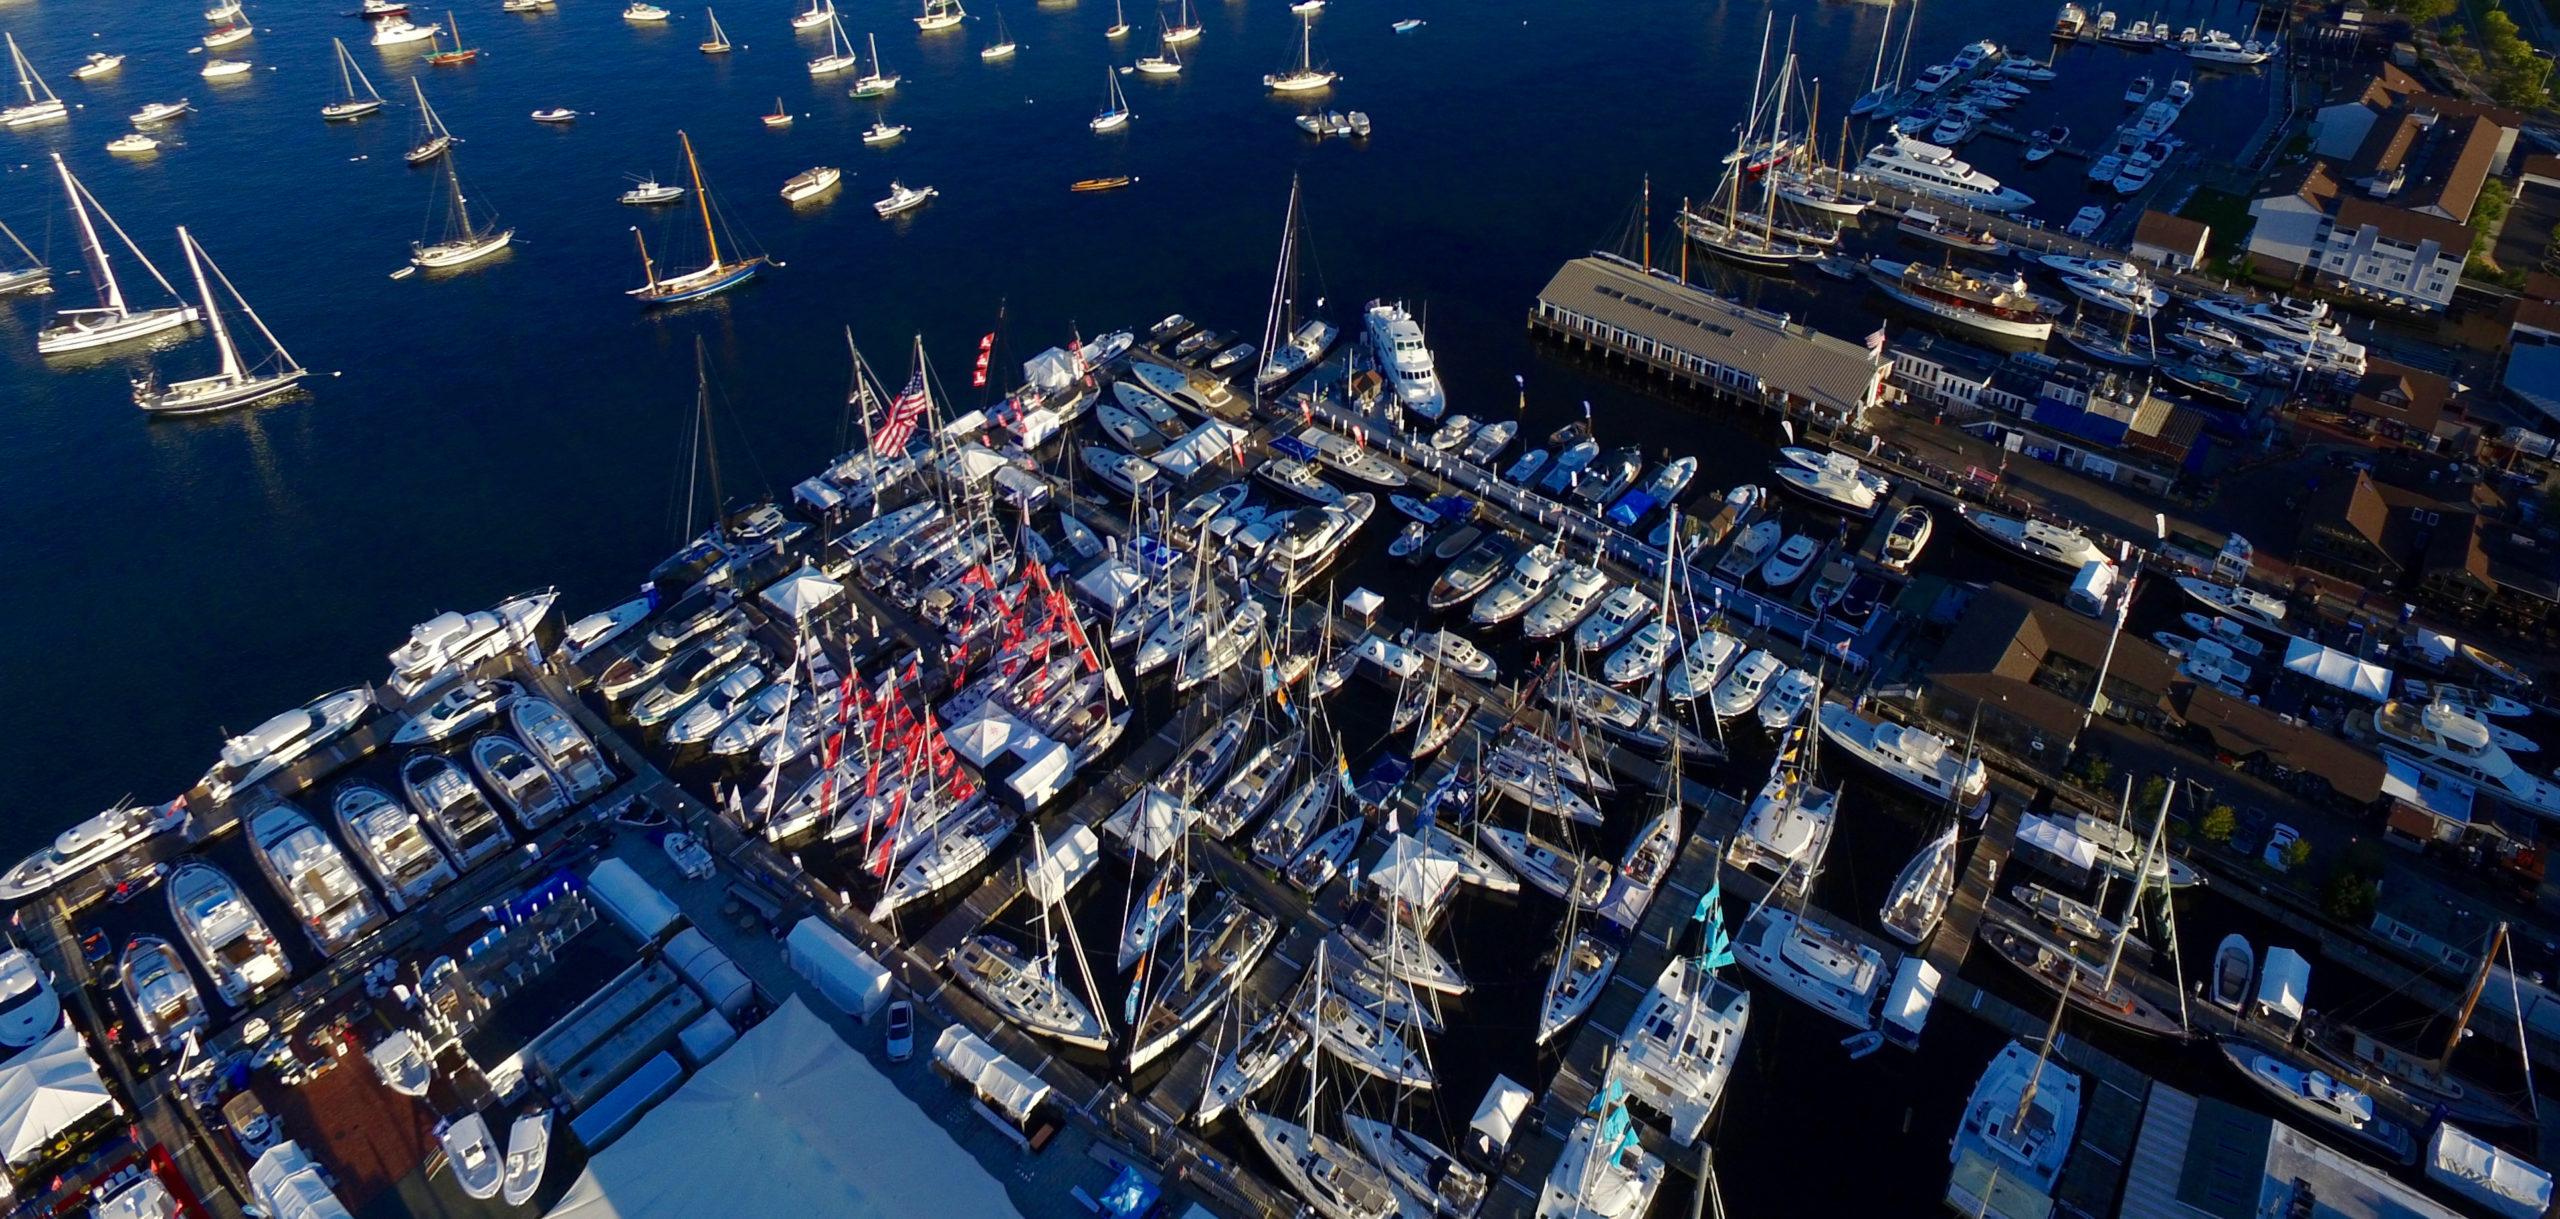 Newport Boat Show image